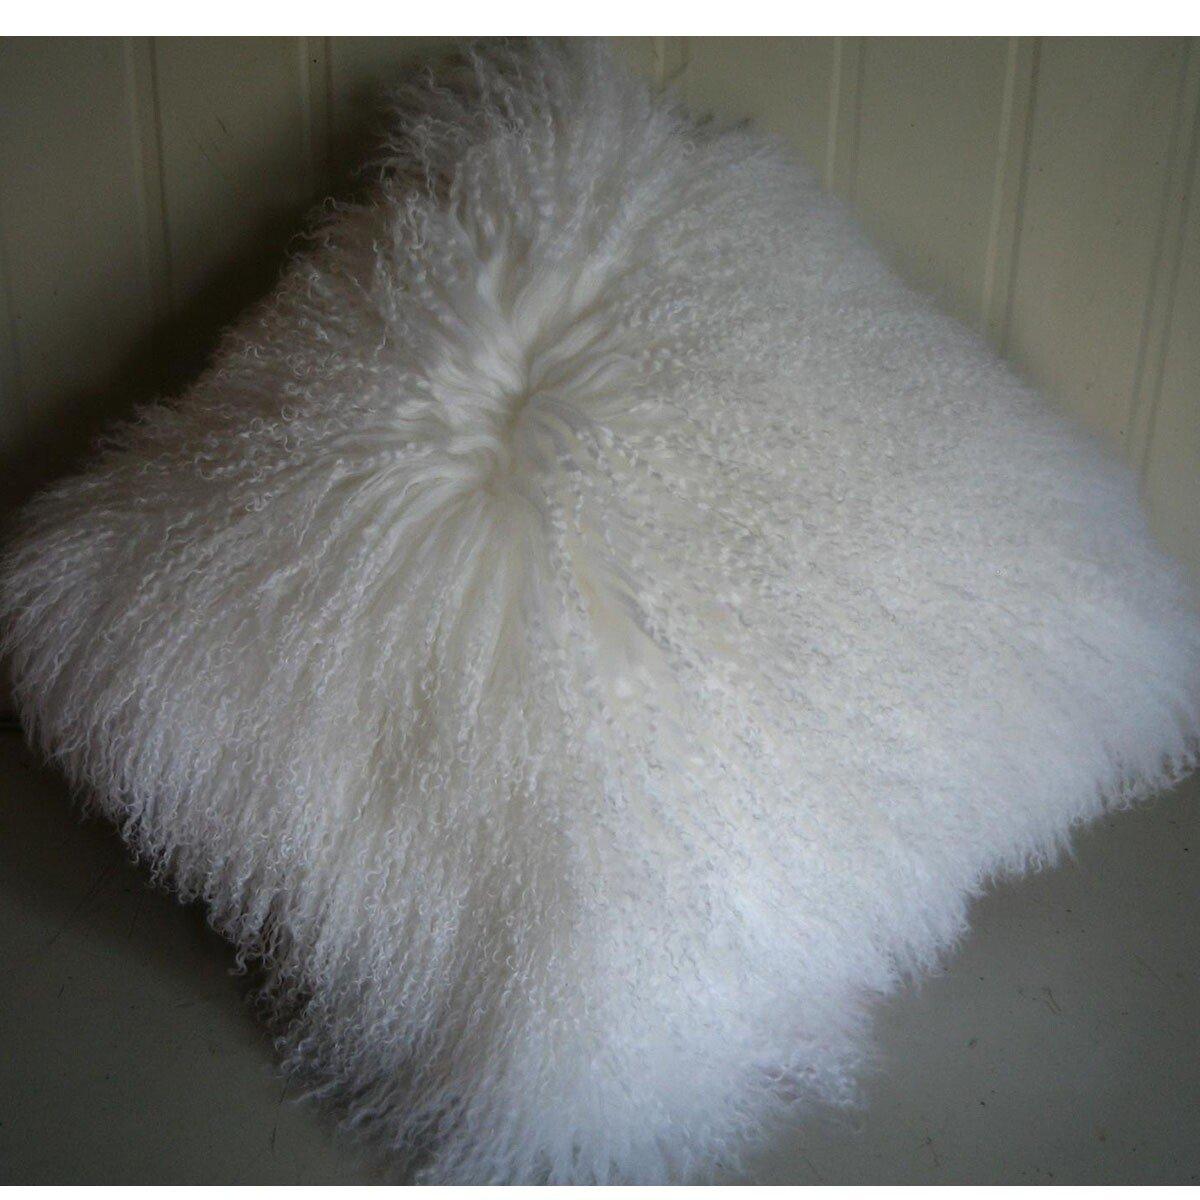 ROSE FEATHER Real 100% Tibetan Mongolian Lamb Sheepskin Wool Fur Super Soft Plush Leather Pillowcase Cushion Cover,White 24x24inch